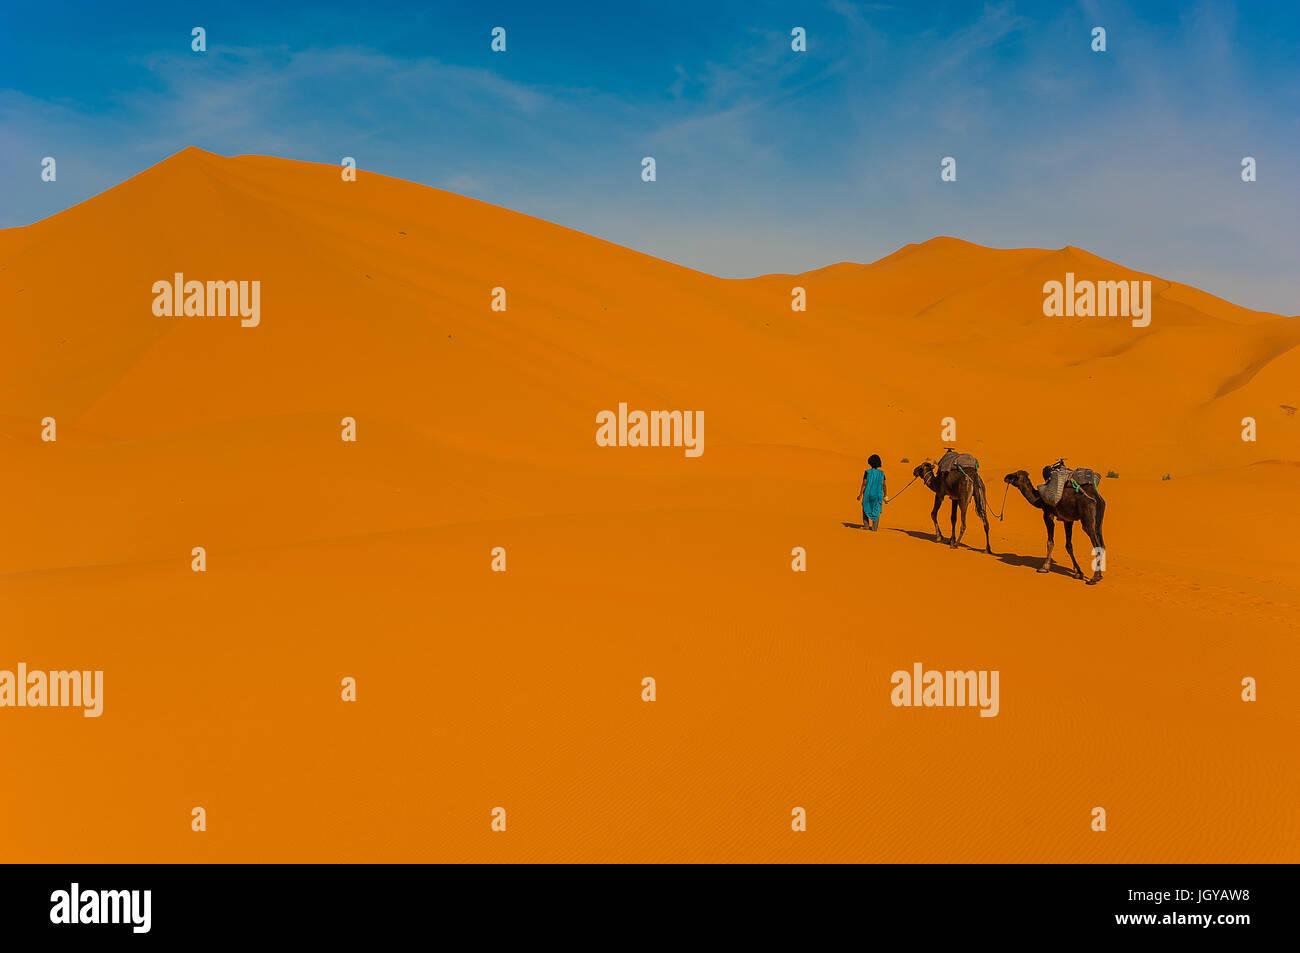 Camel caravan in Erg Chebbi Desert, Sahara Desert near Merzouga, Morocco - Stock Image